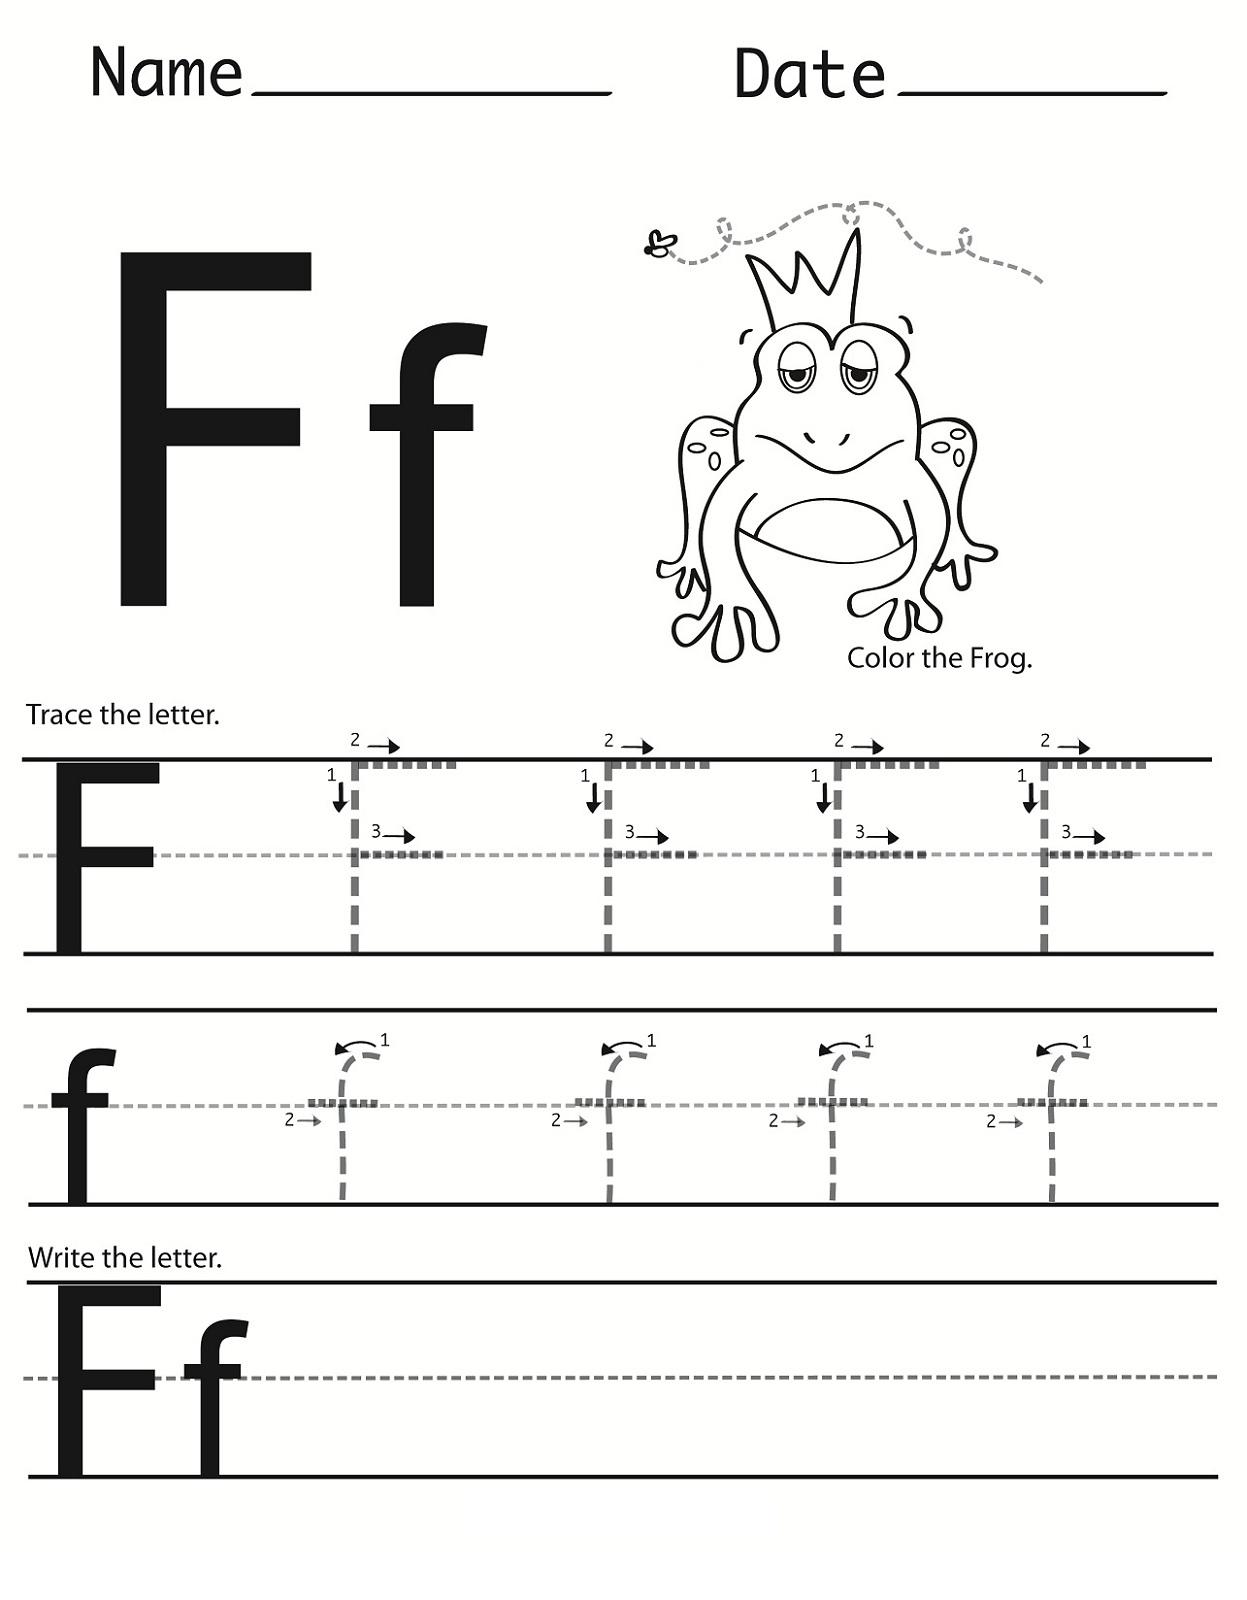 Letter F Worksheet For Preschool And Kindergarten | Activity within Tracing Letter F Worksheets